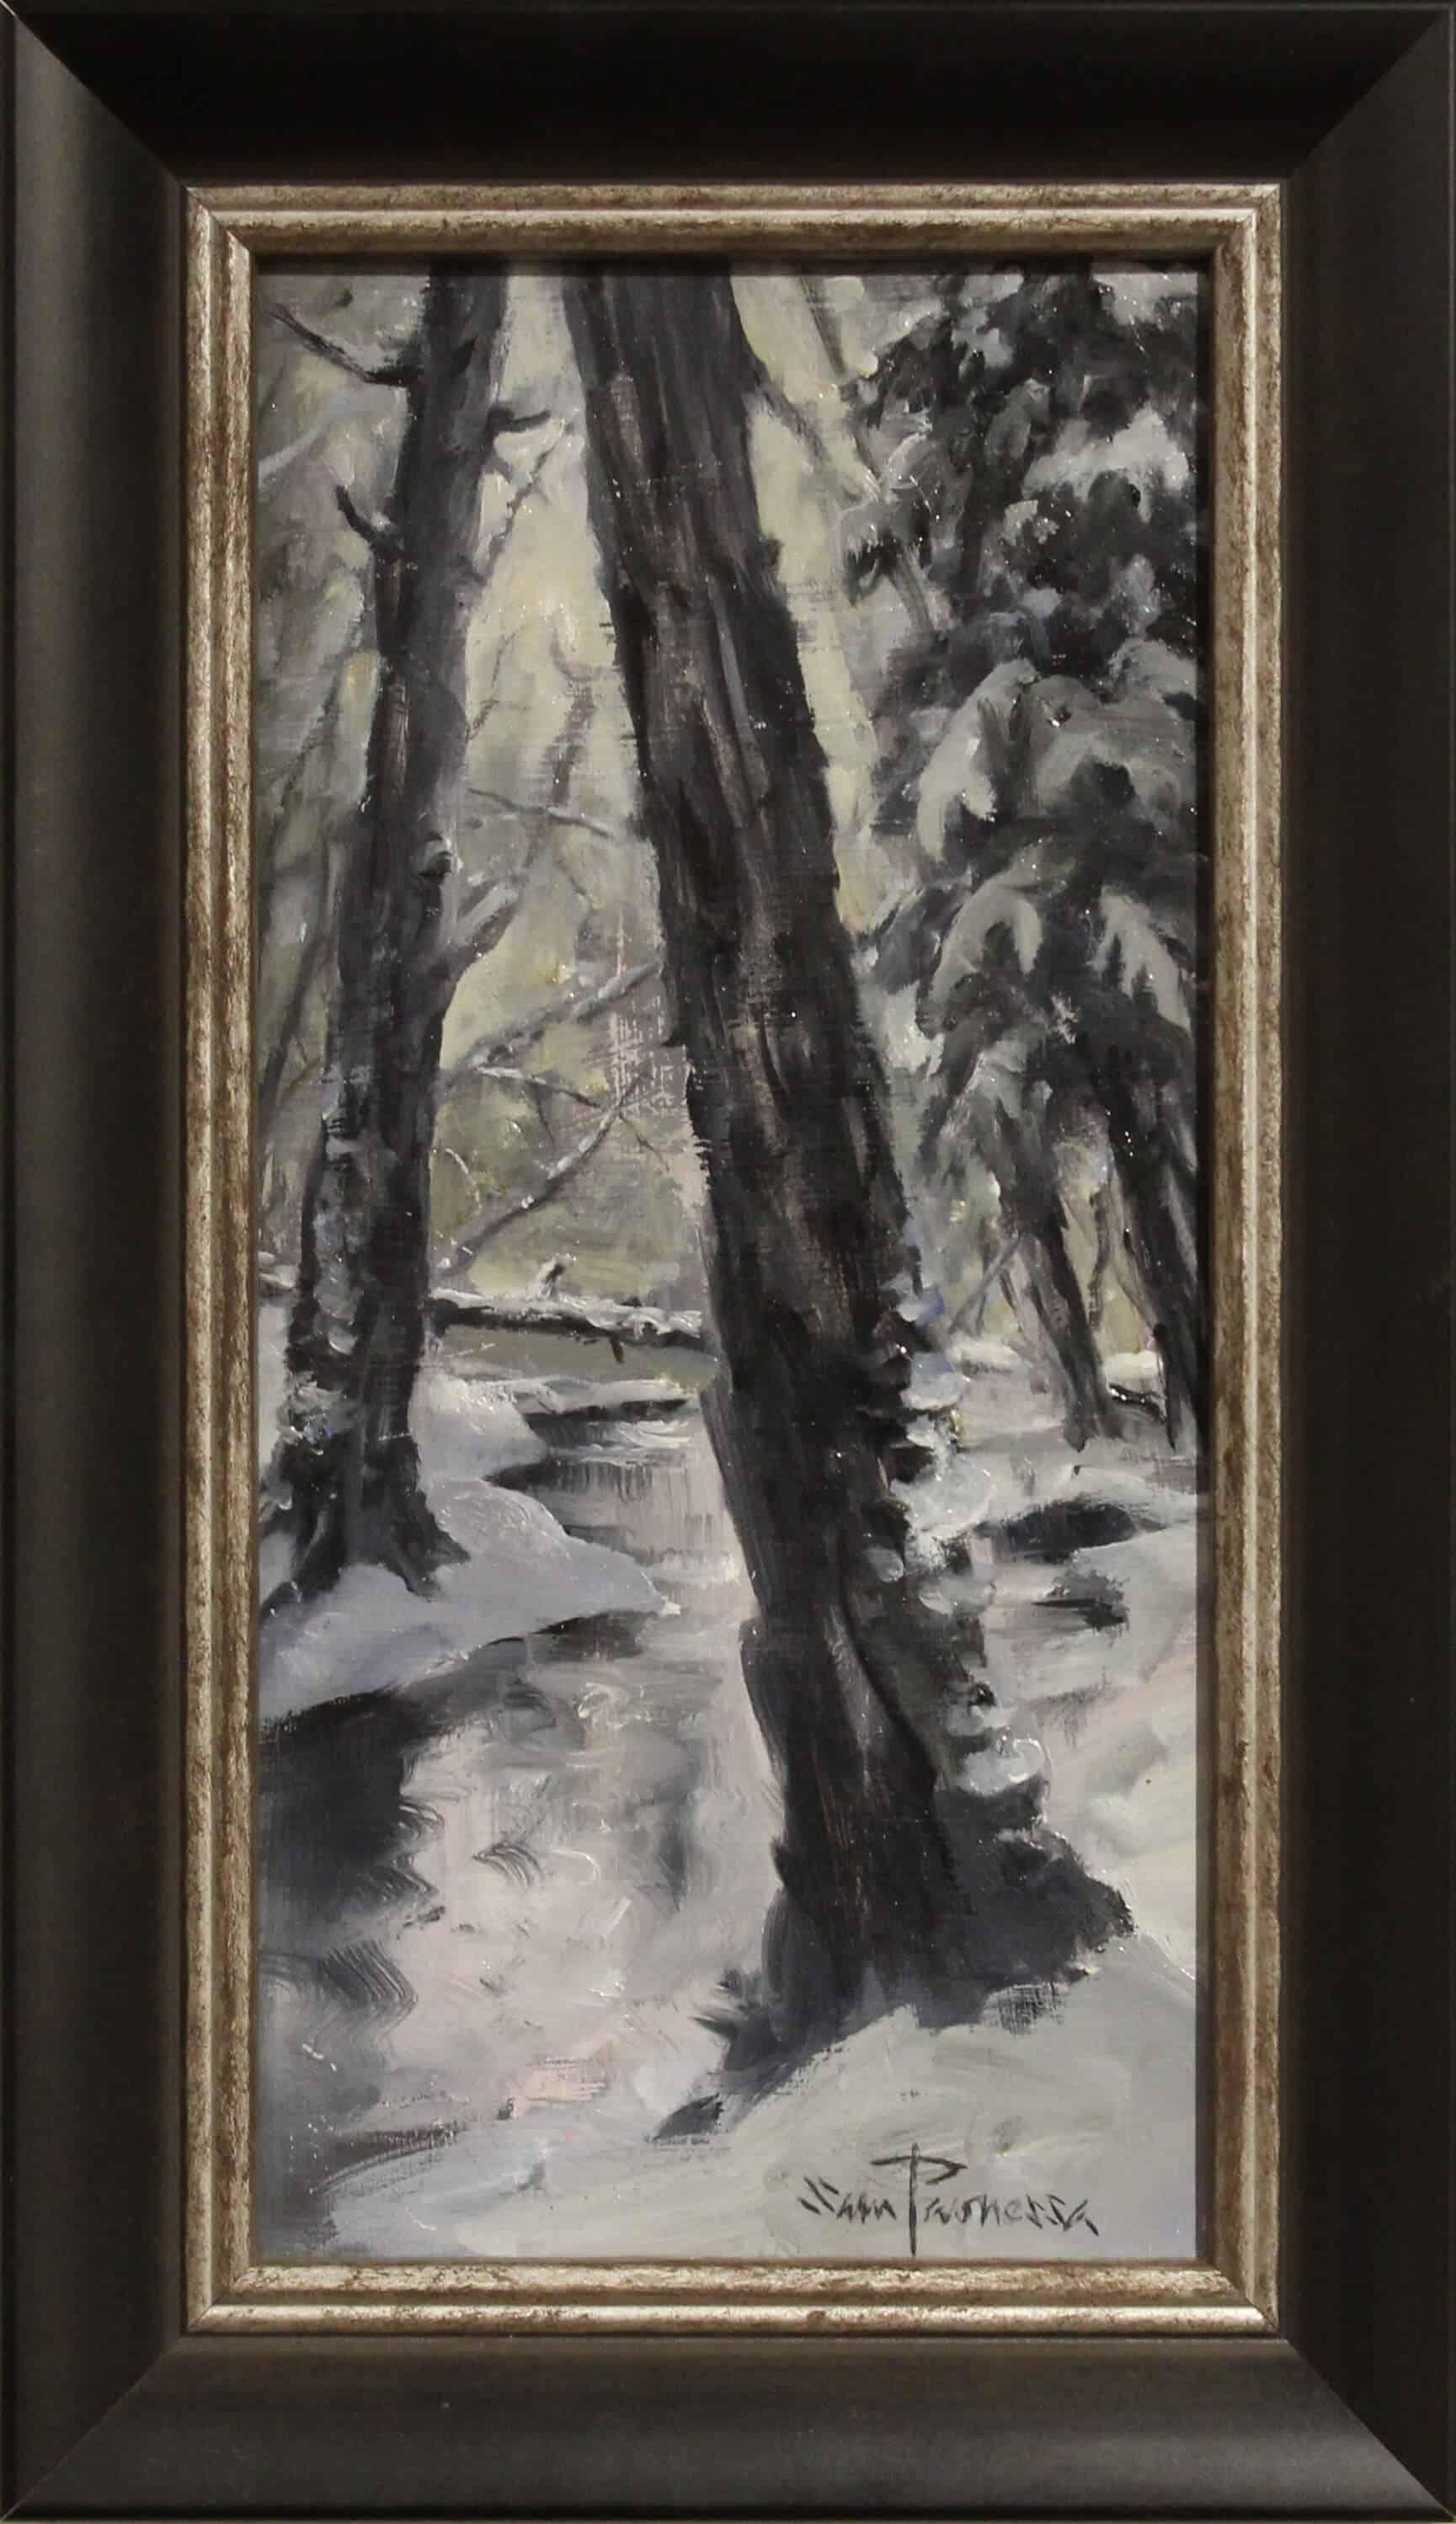 Sam Paonessa Forest Tonal Sketch 6X12 D1